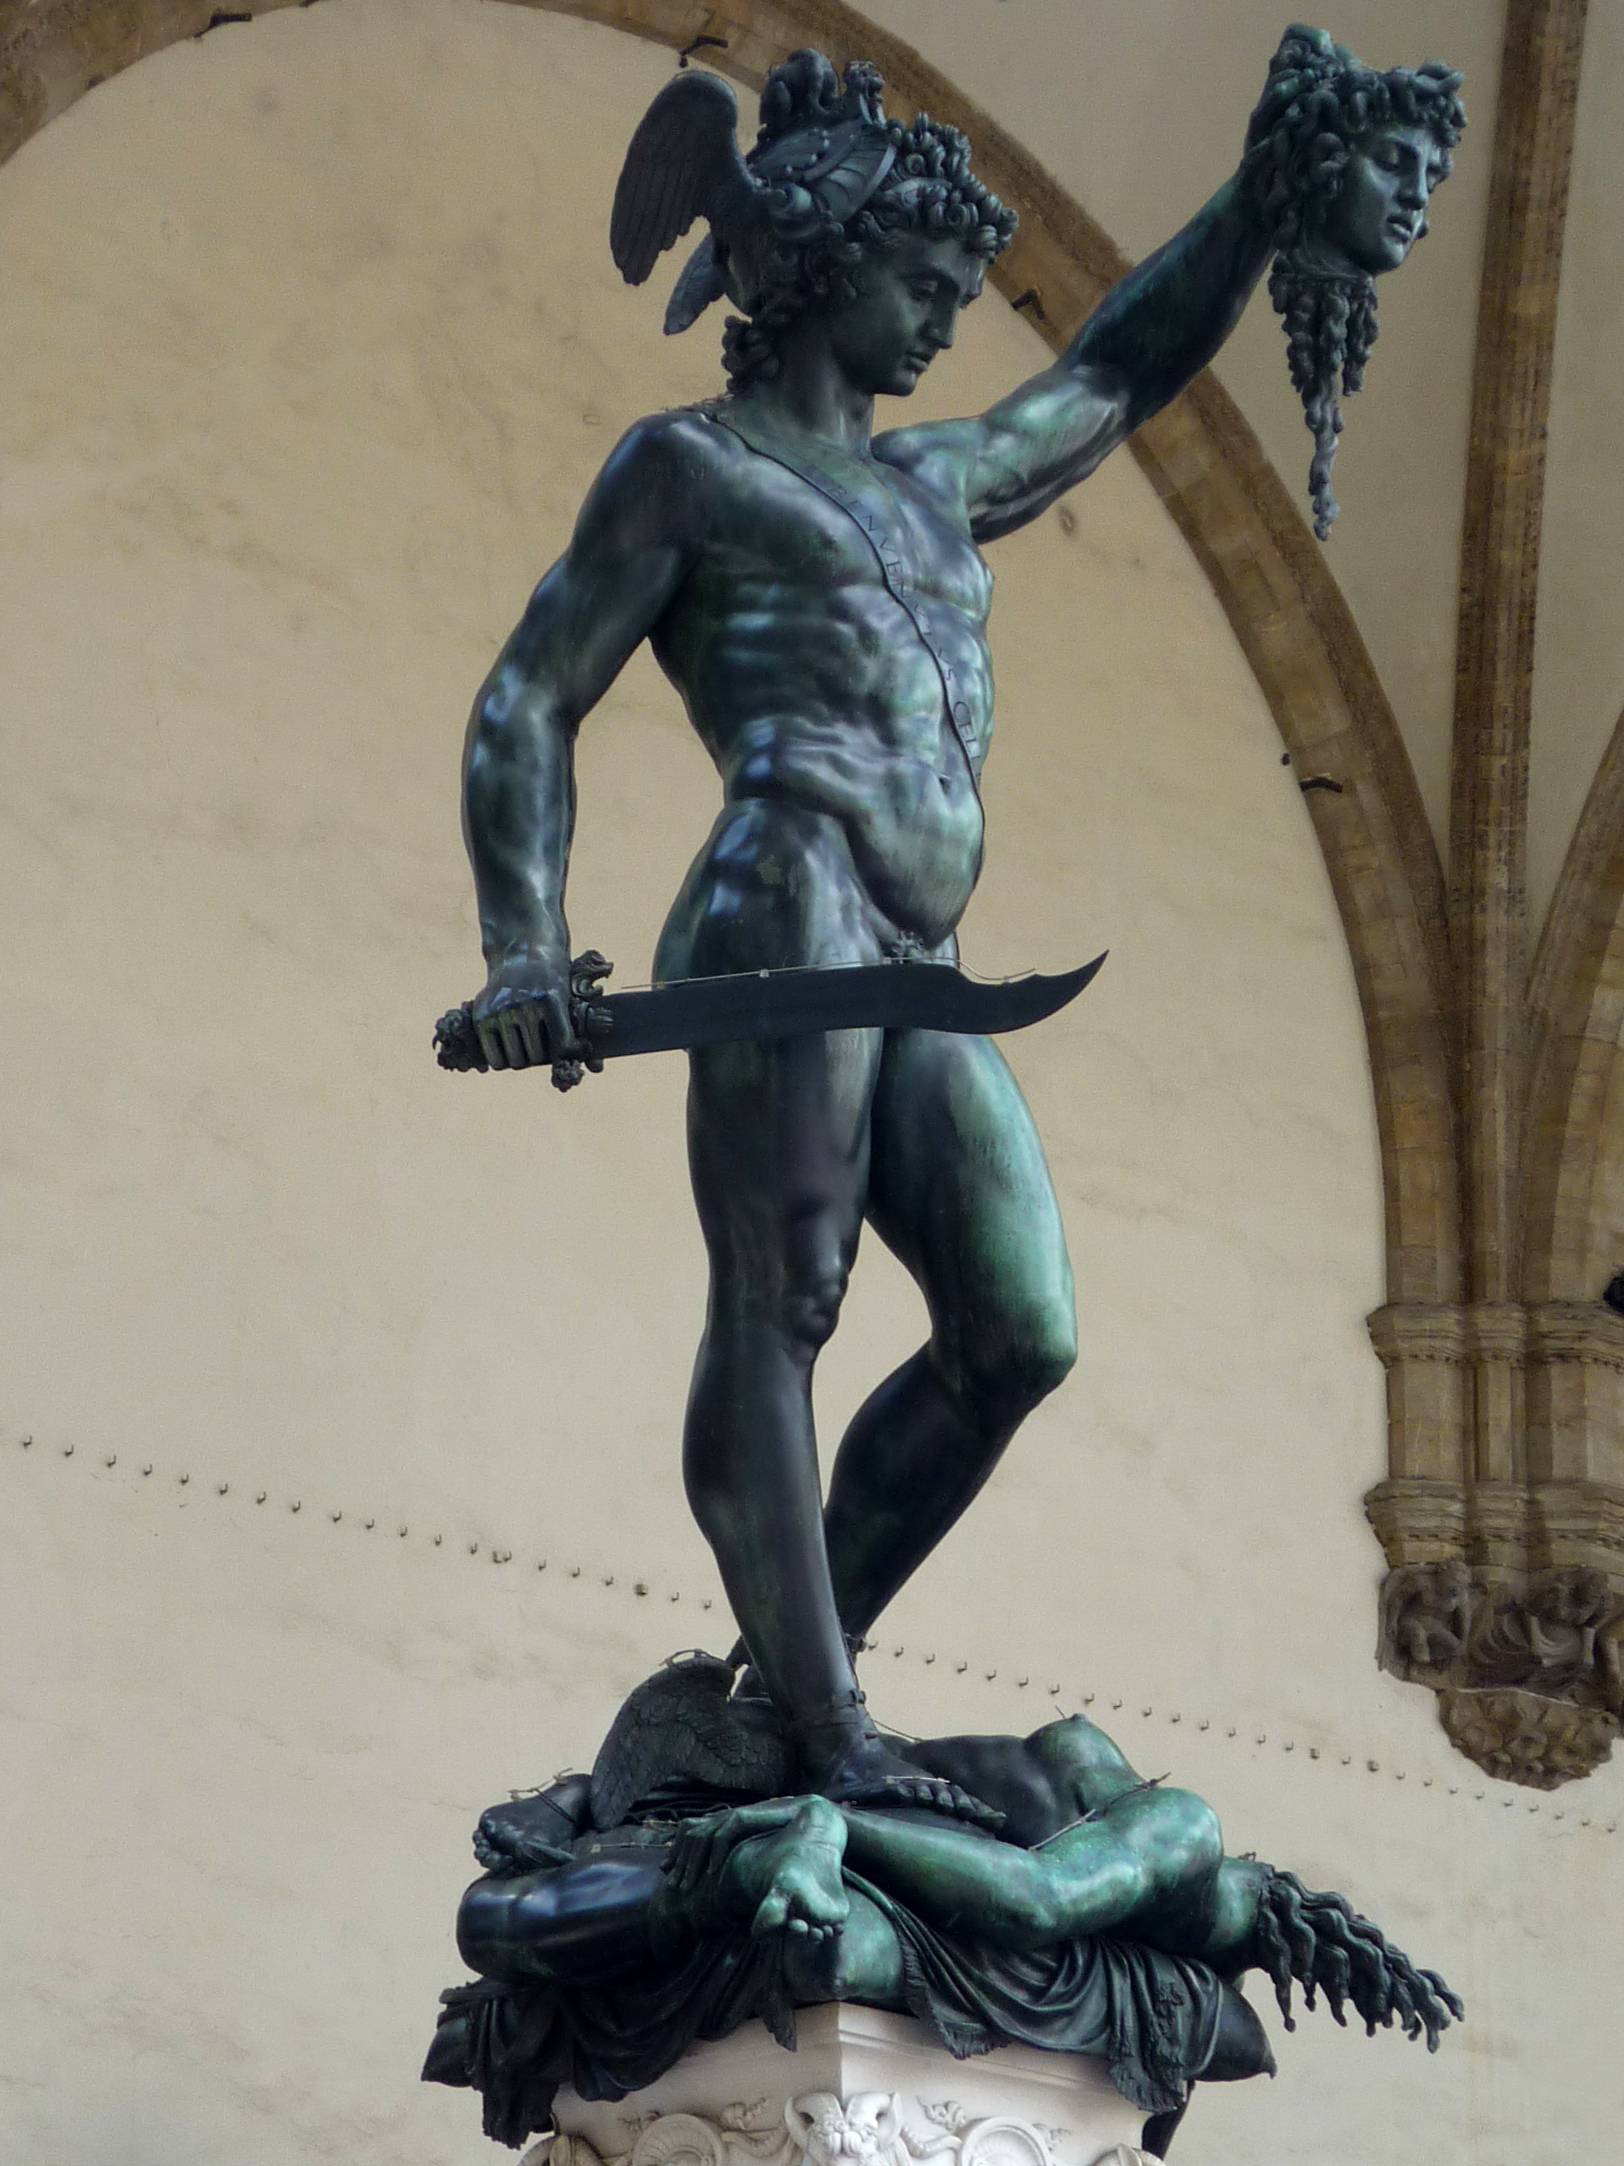 https://upload.wikimedia.org/wikipedia/commons/6/69/Perseo_of_Benvenuto_Cellini.jpg